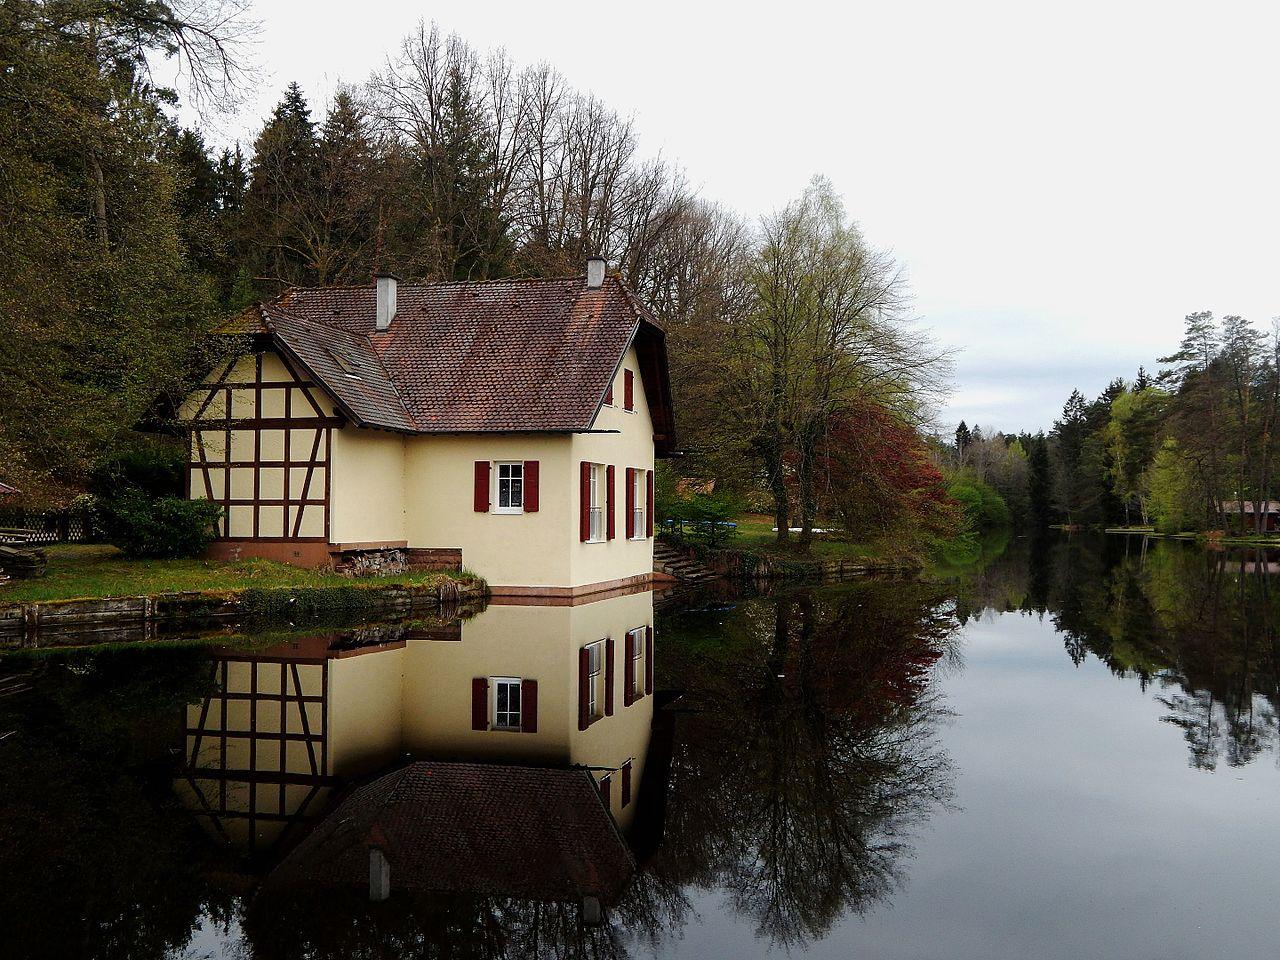 Filehaus Am See, Ludwigswinkel, Biosphärenreservat